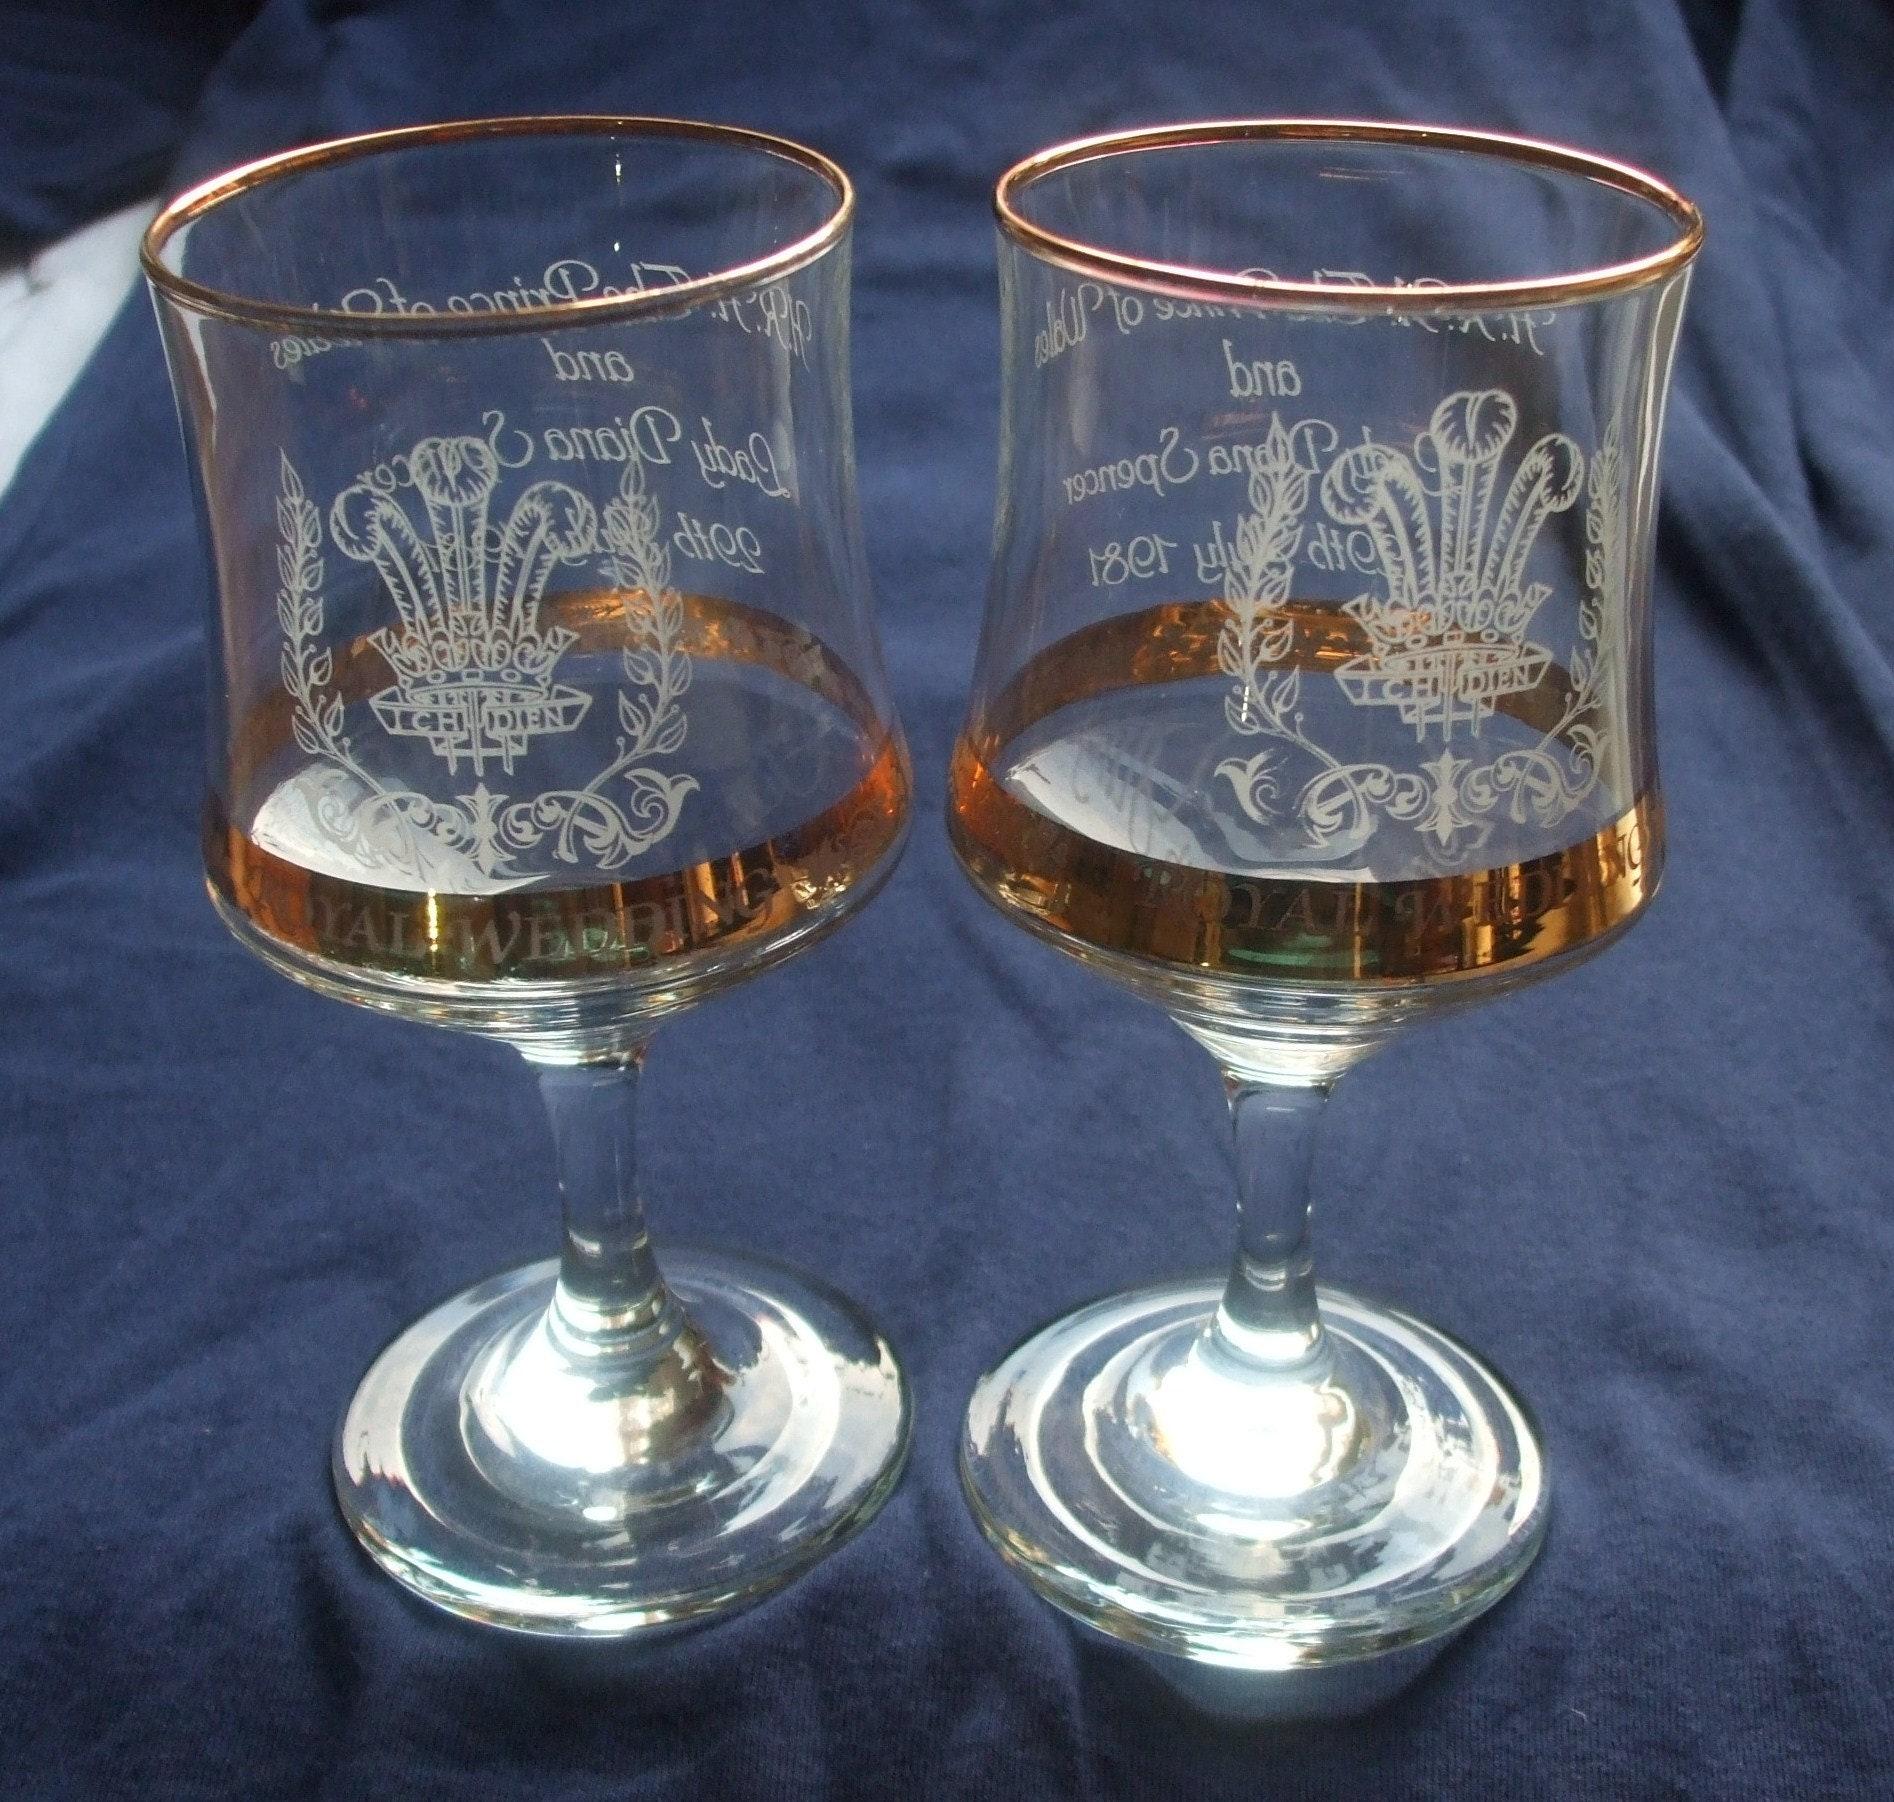 Lady Diana Wedding Glasses: Pair Of Royal Wedding Commemorative Goblets / Wine Glasses